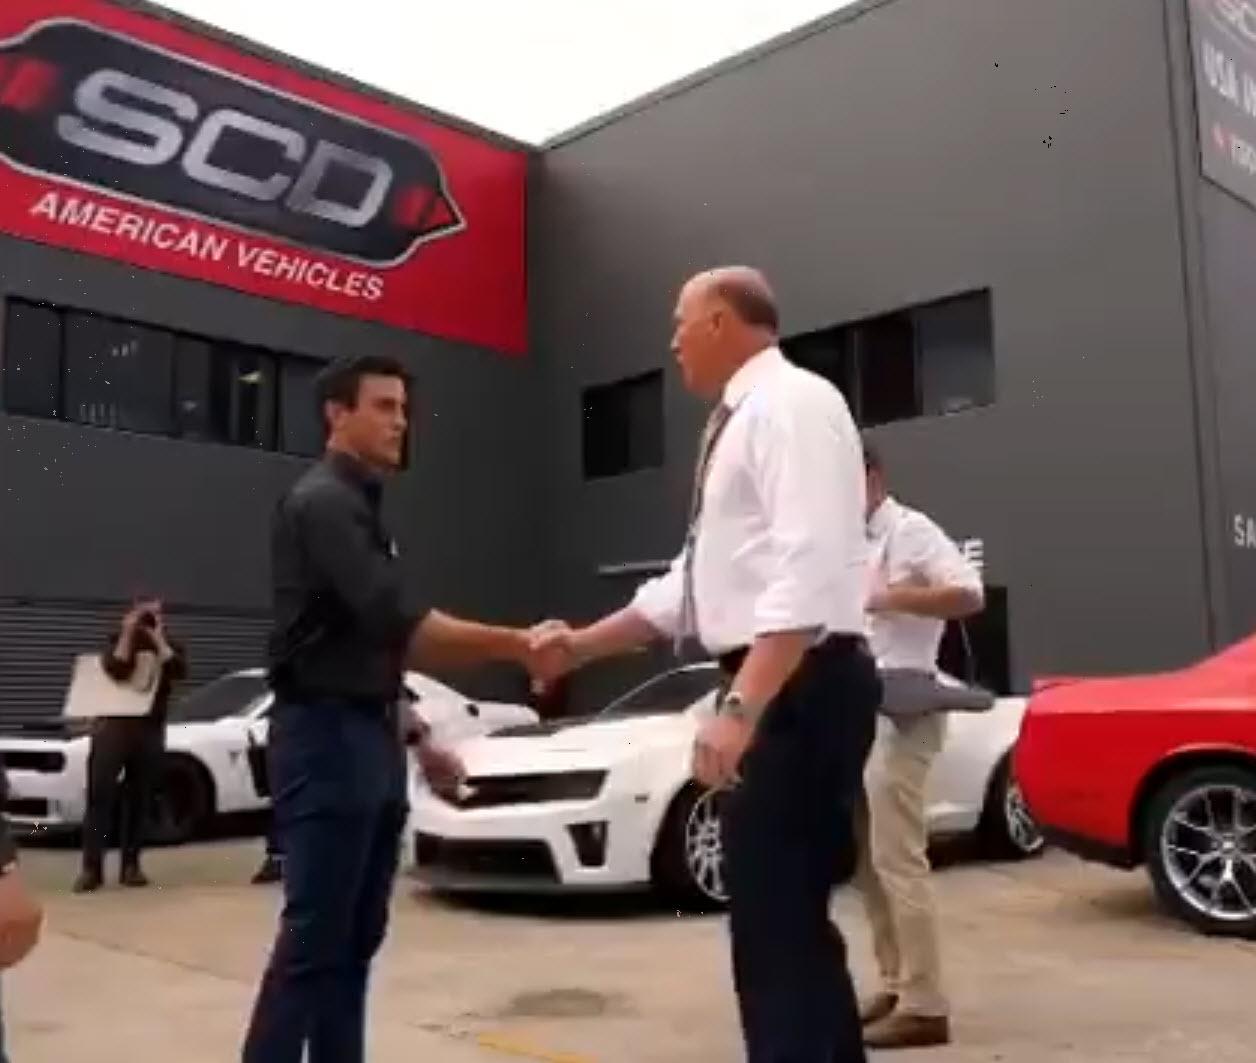 SCD American Vehicles Director Eddie Kocwa welcomes Peter Dutton to the Brisbane dealership.